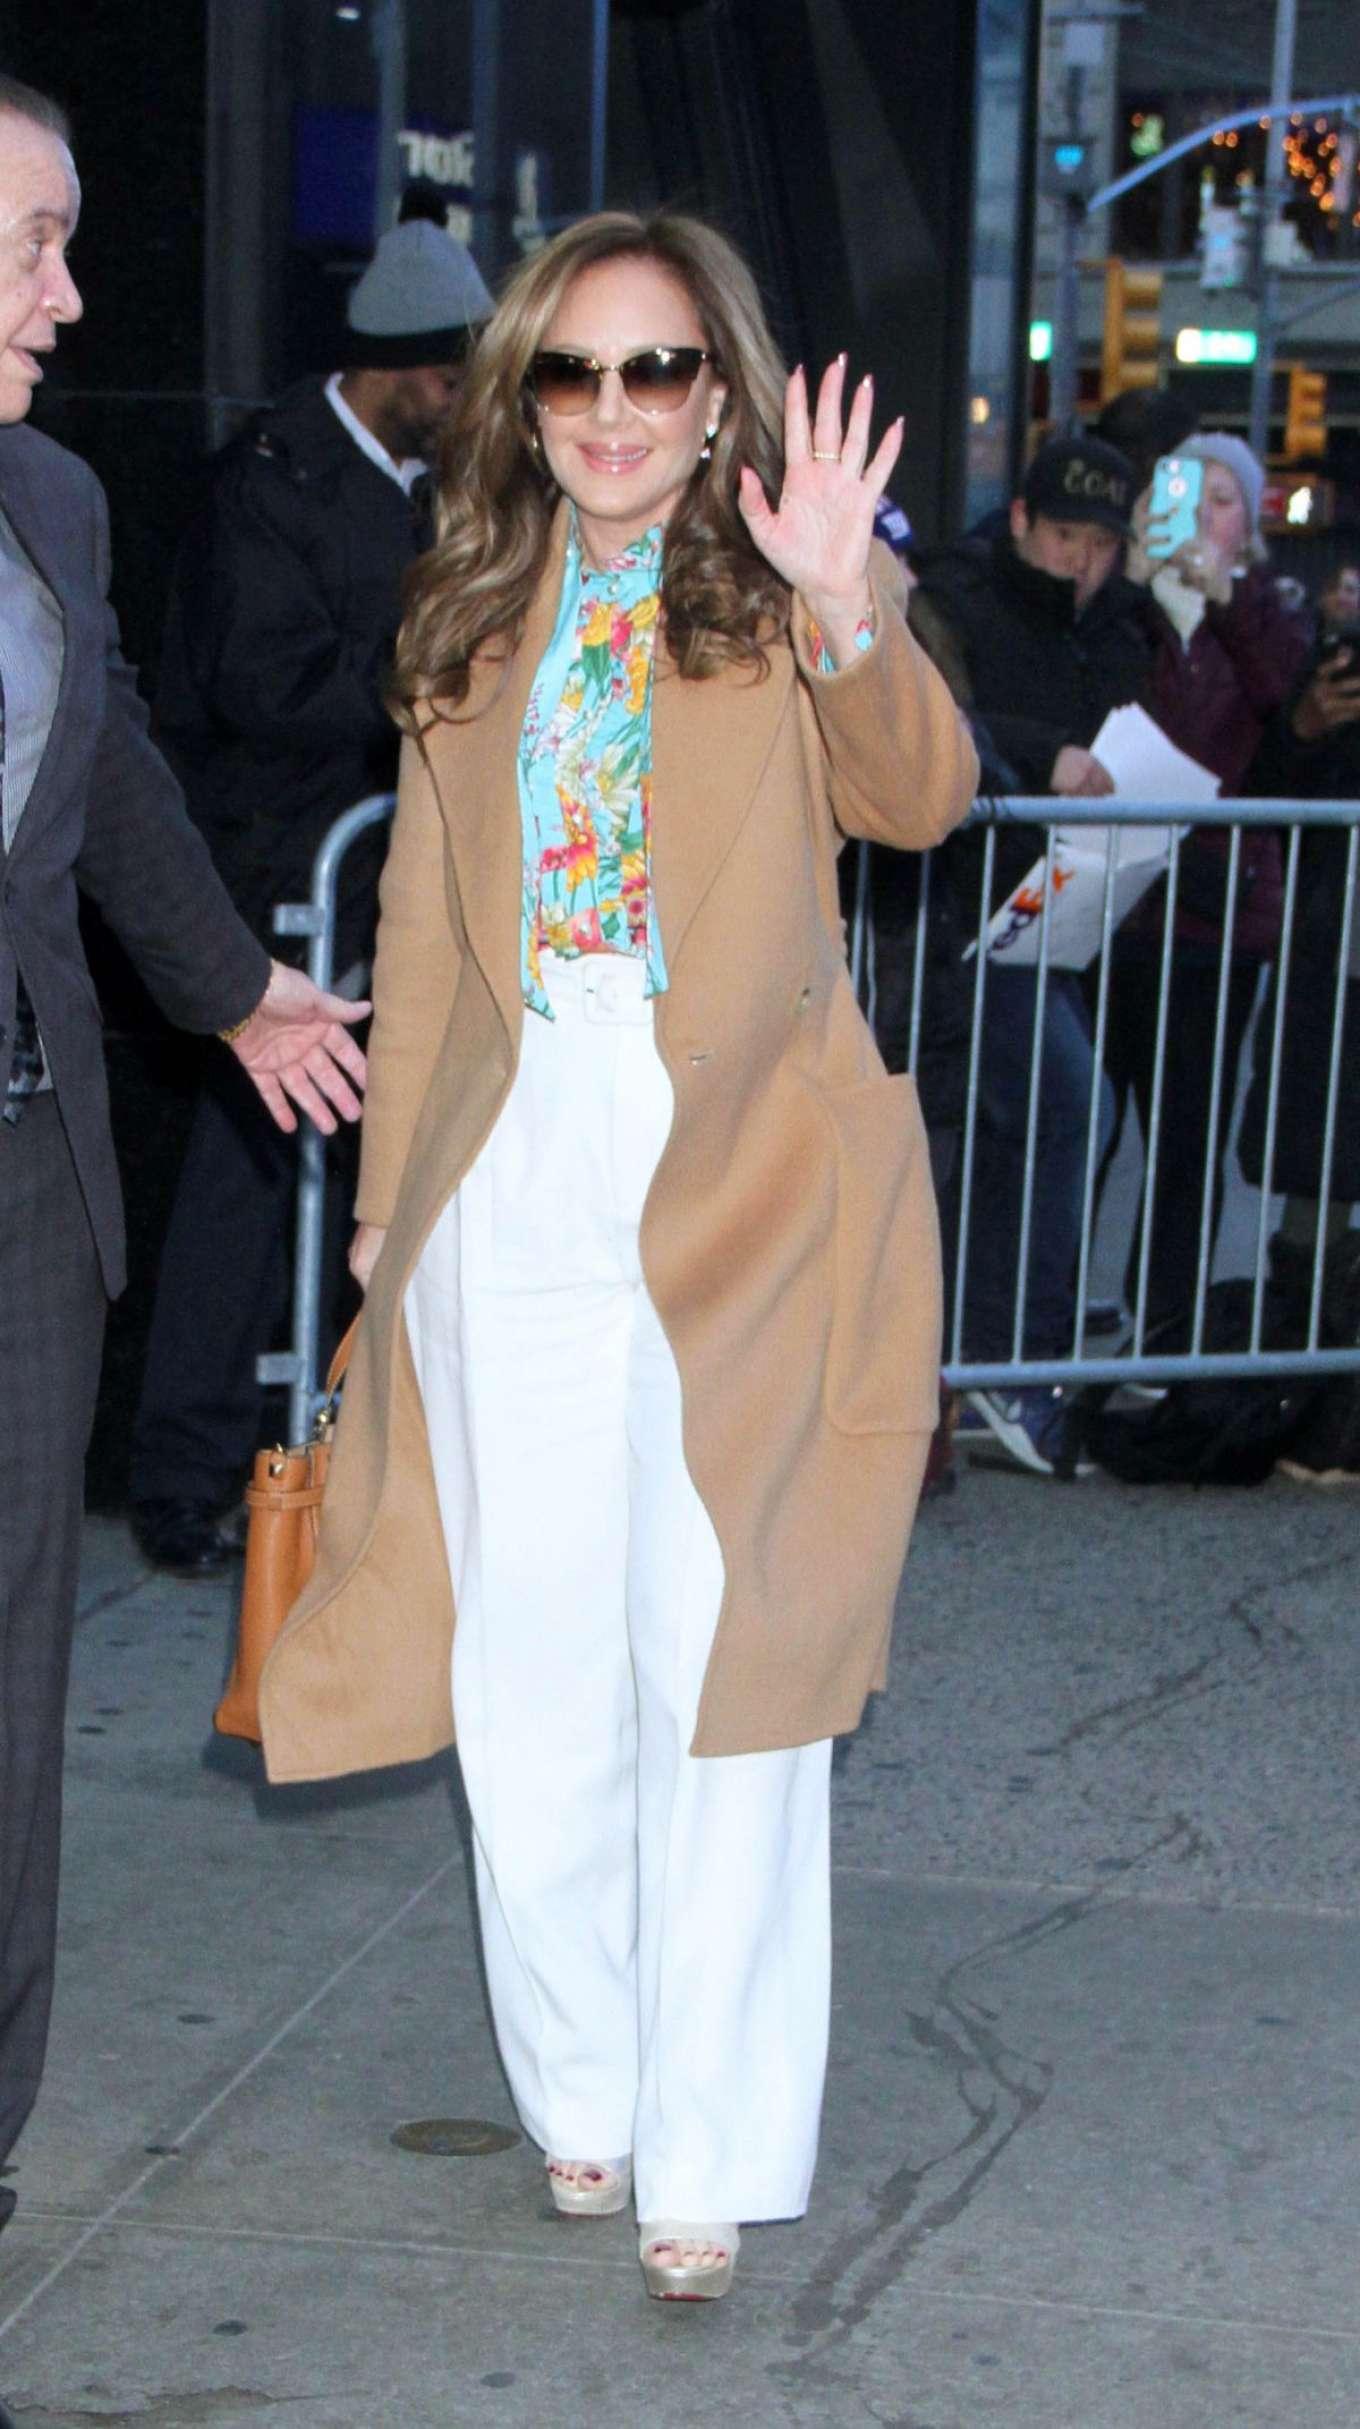 Leah Remini - Arrives at Good Morning America in New York